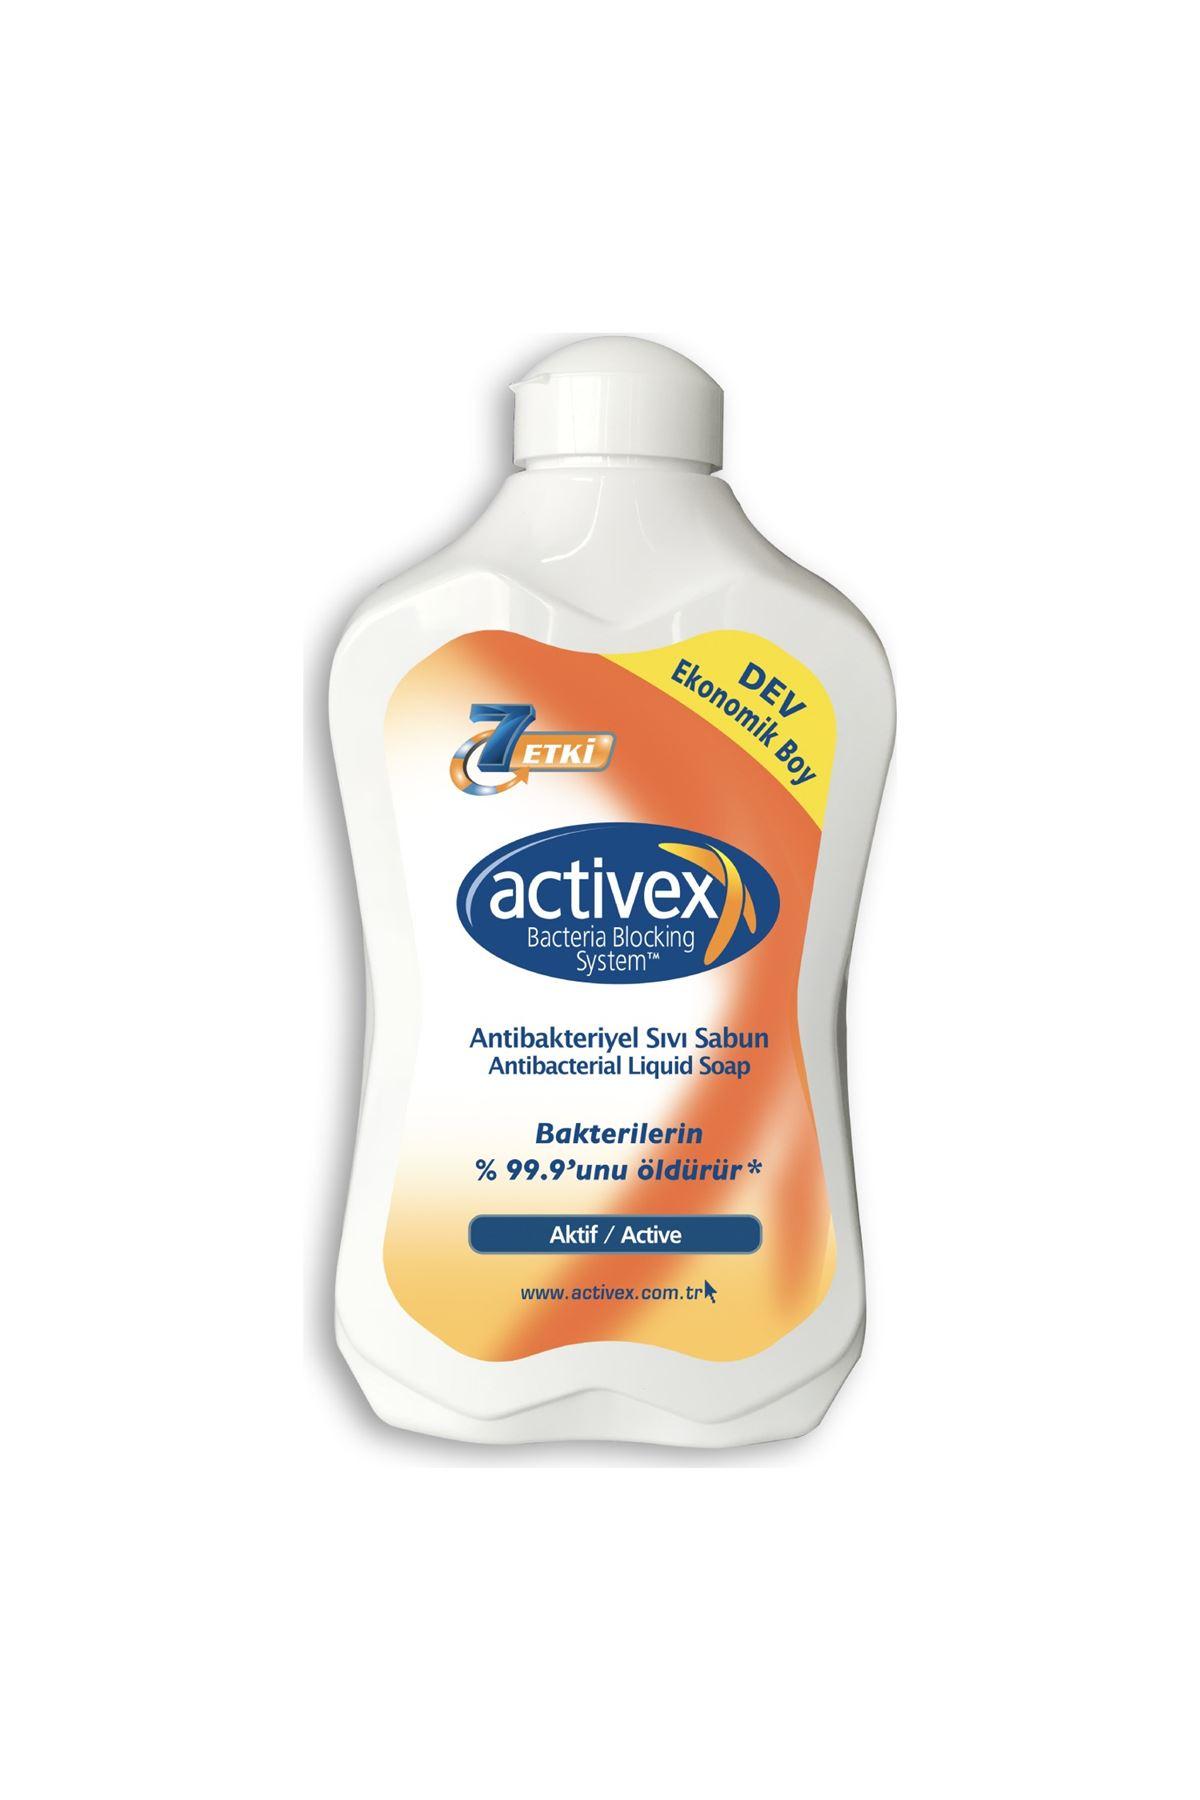 Activex Antibakteriyel Aktif Sıvı Sabun 1500 ml